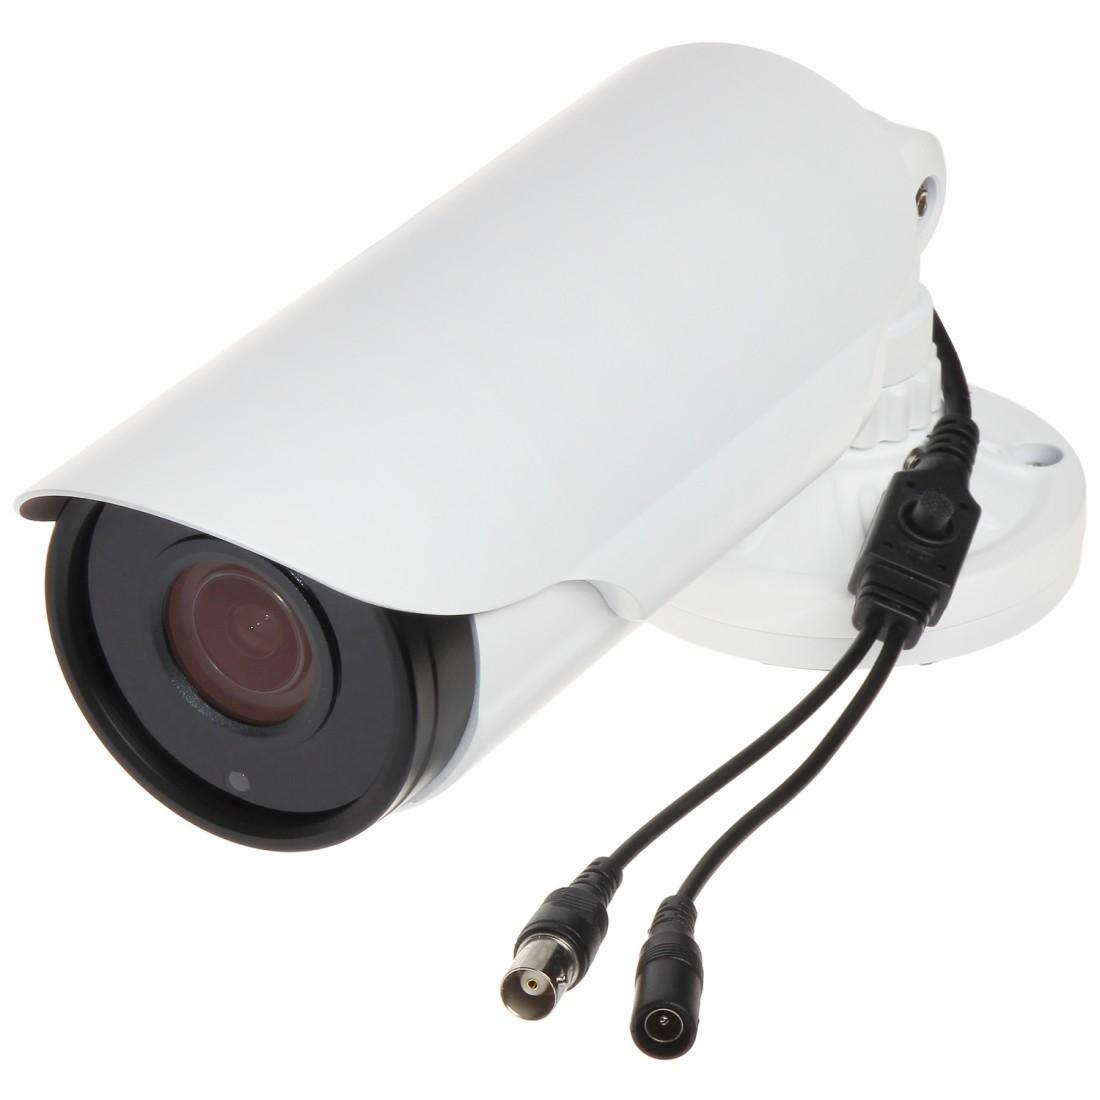 KAMERA AHD, HD-CVI, HD-TVI, PAL APTI-H24C6-2714W-Z - 1080p 2.7 ... 13.5 mm -MOTOZOOM